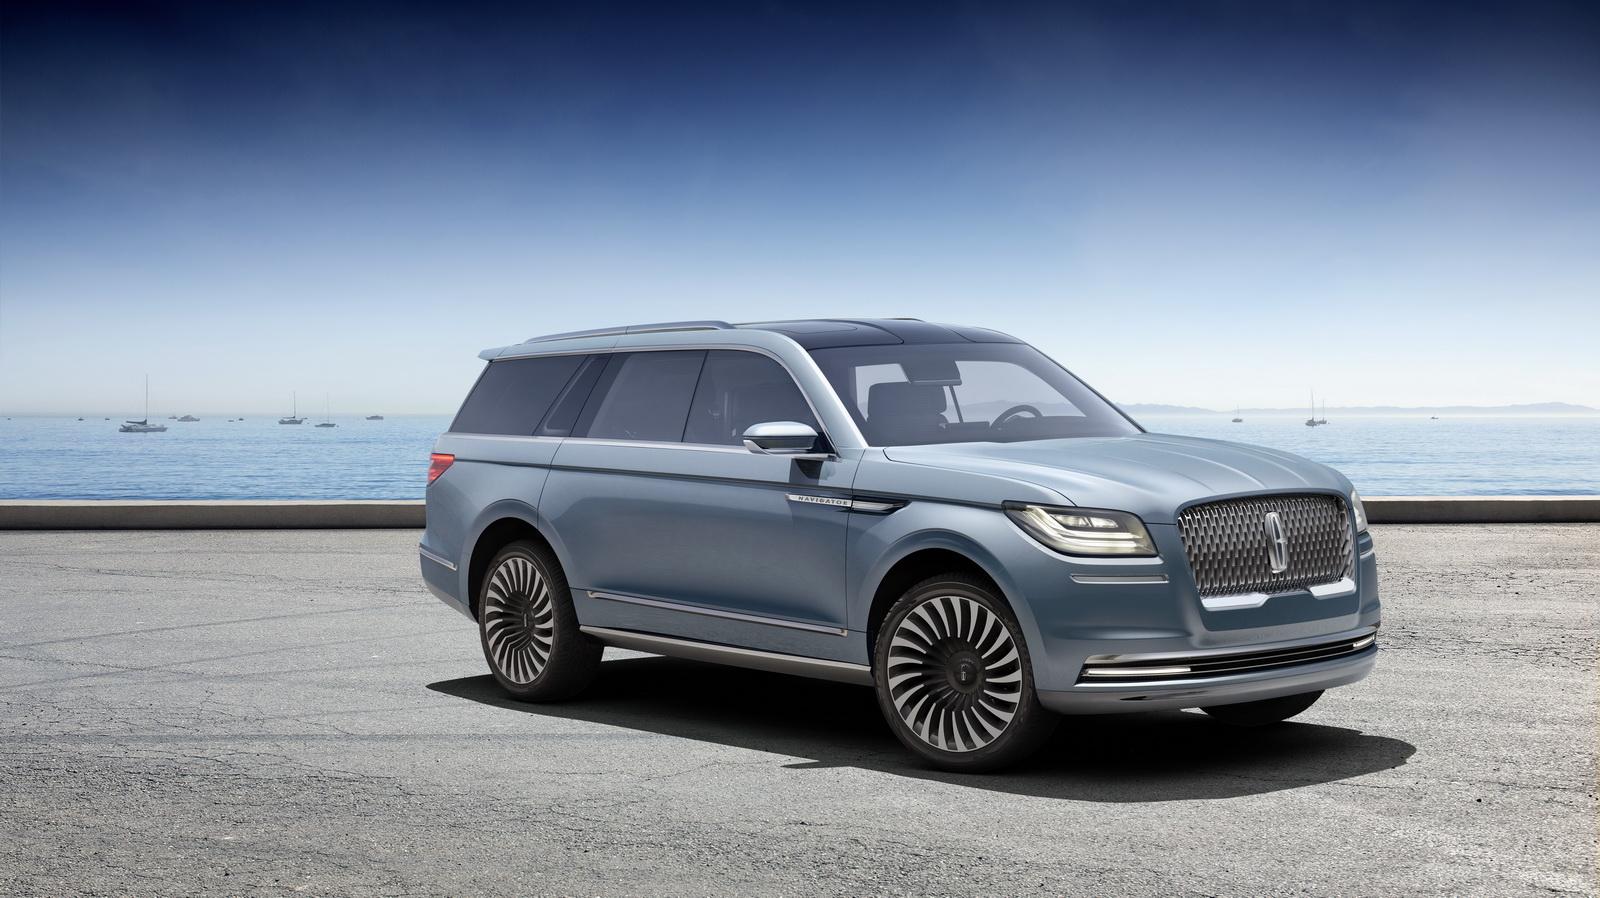 2016-Lincoln-Navigator-Concept-07.jpg